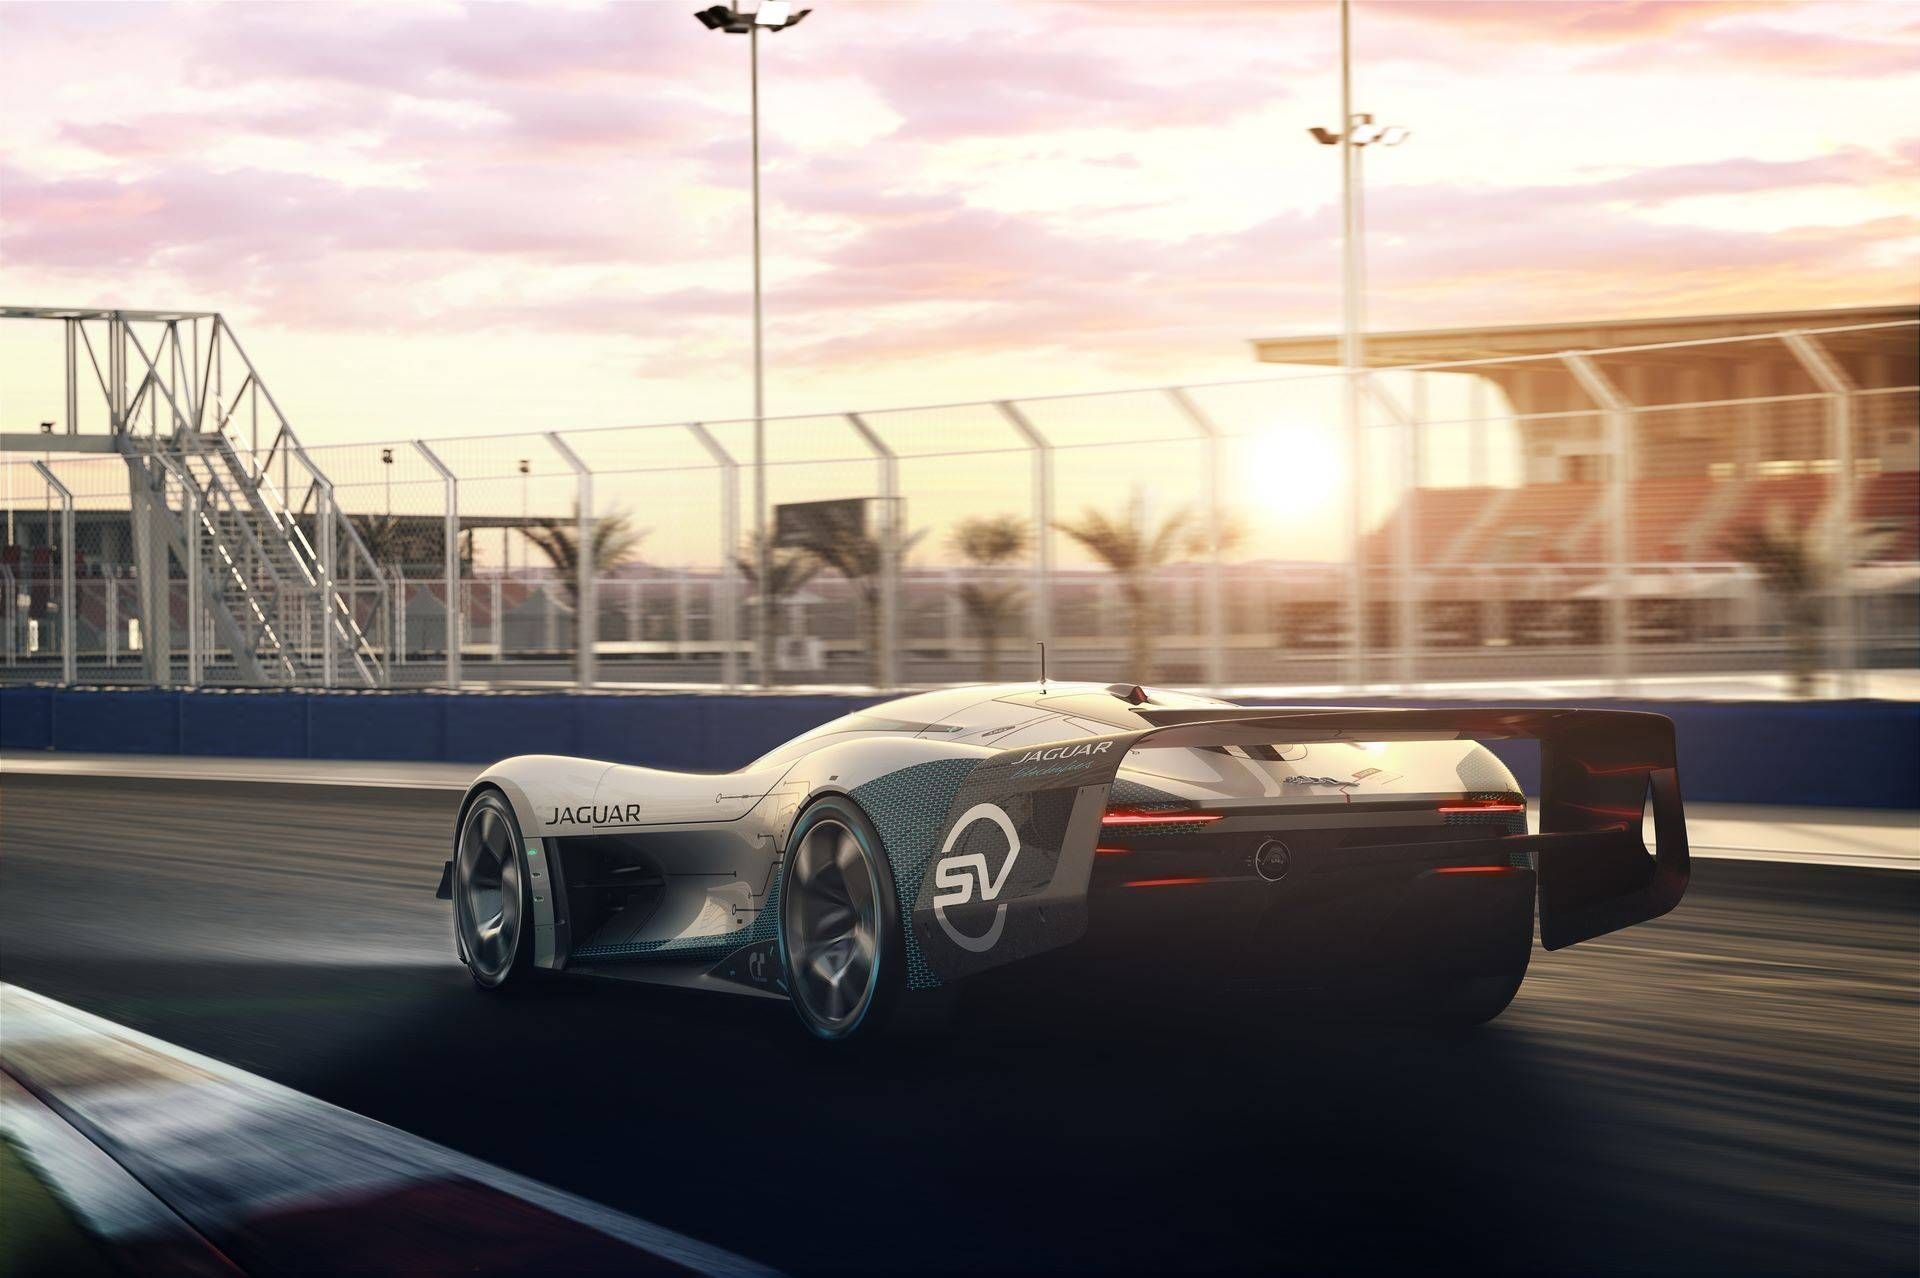 Jaguar-Vision-Gran-Turismo-SV-1